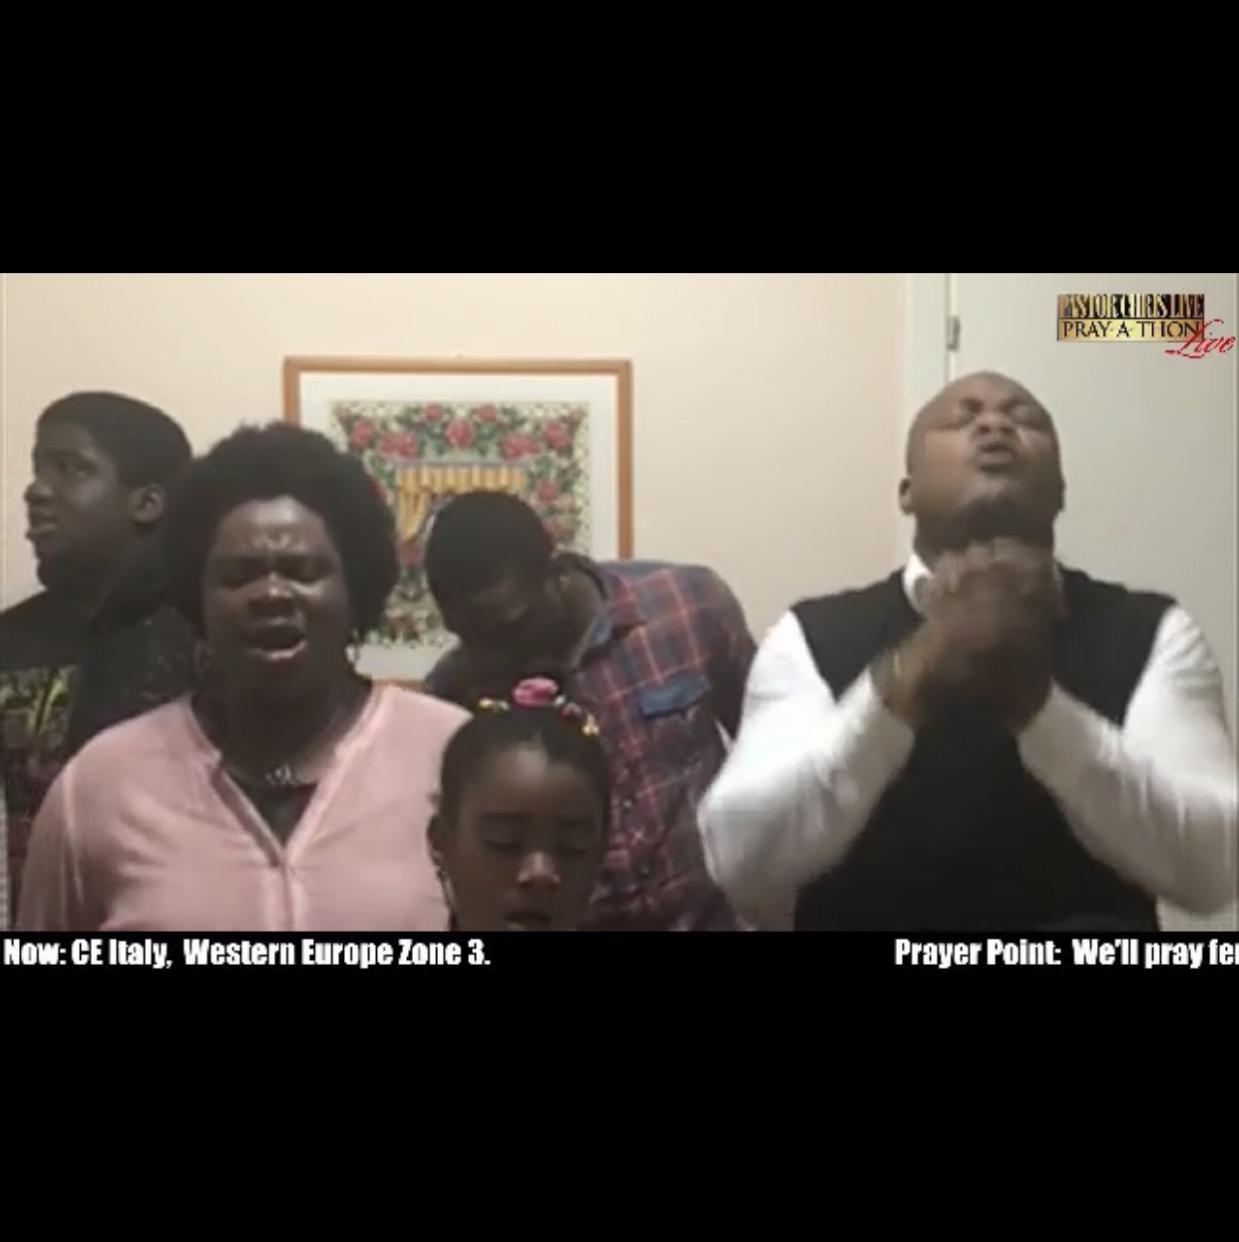 WESTERN EUROPE ZONE 3 Pray-a-thon